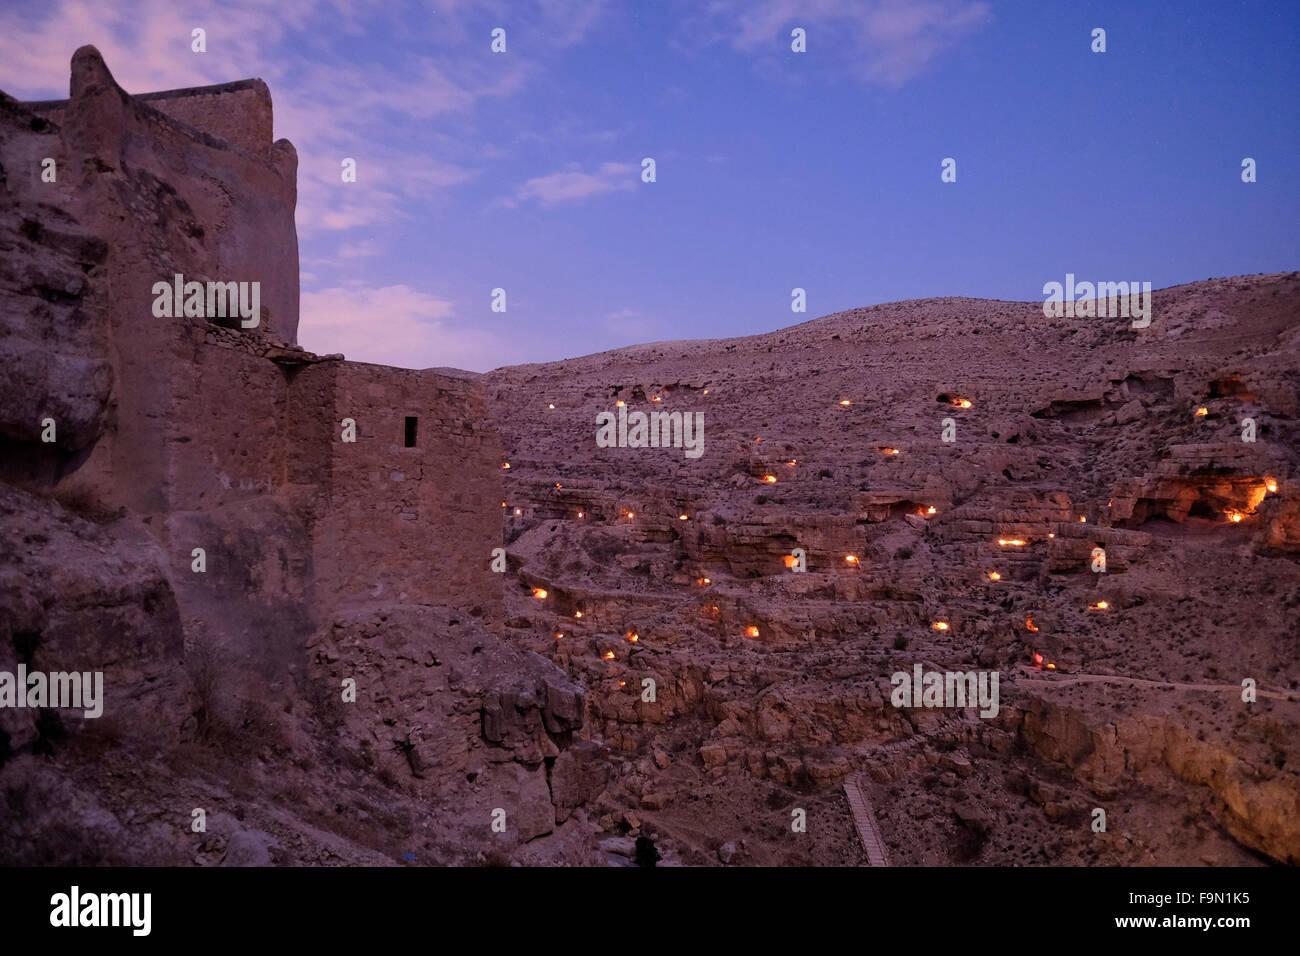 Light candles illuminating small caves near Mar Saba Monastery in the Judaean or Judean desert during Mar Saba Day - Stock Image